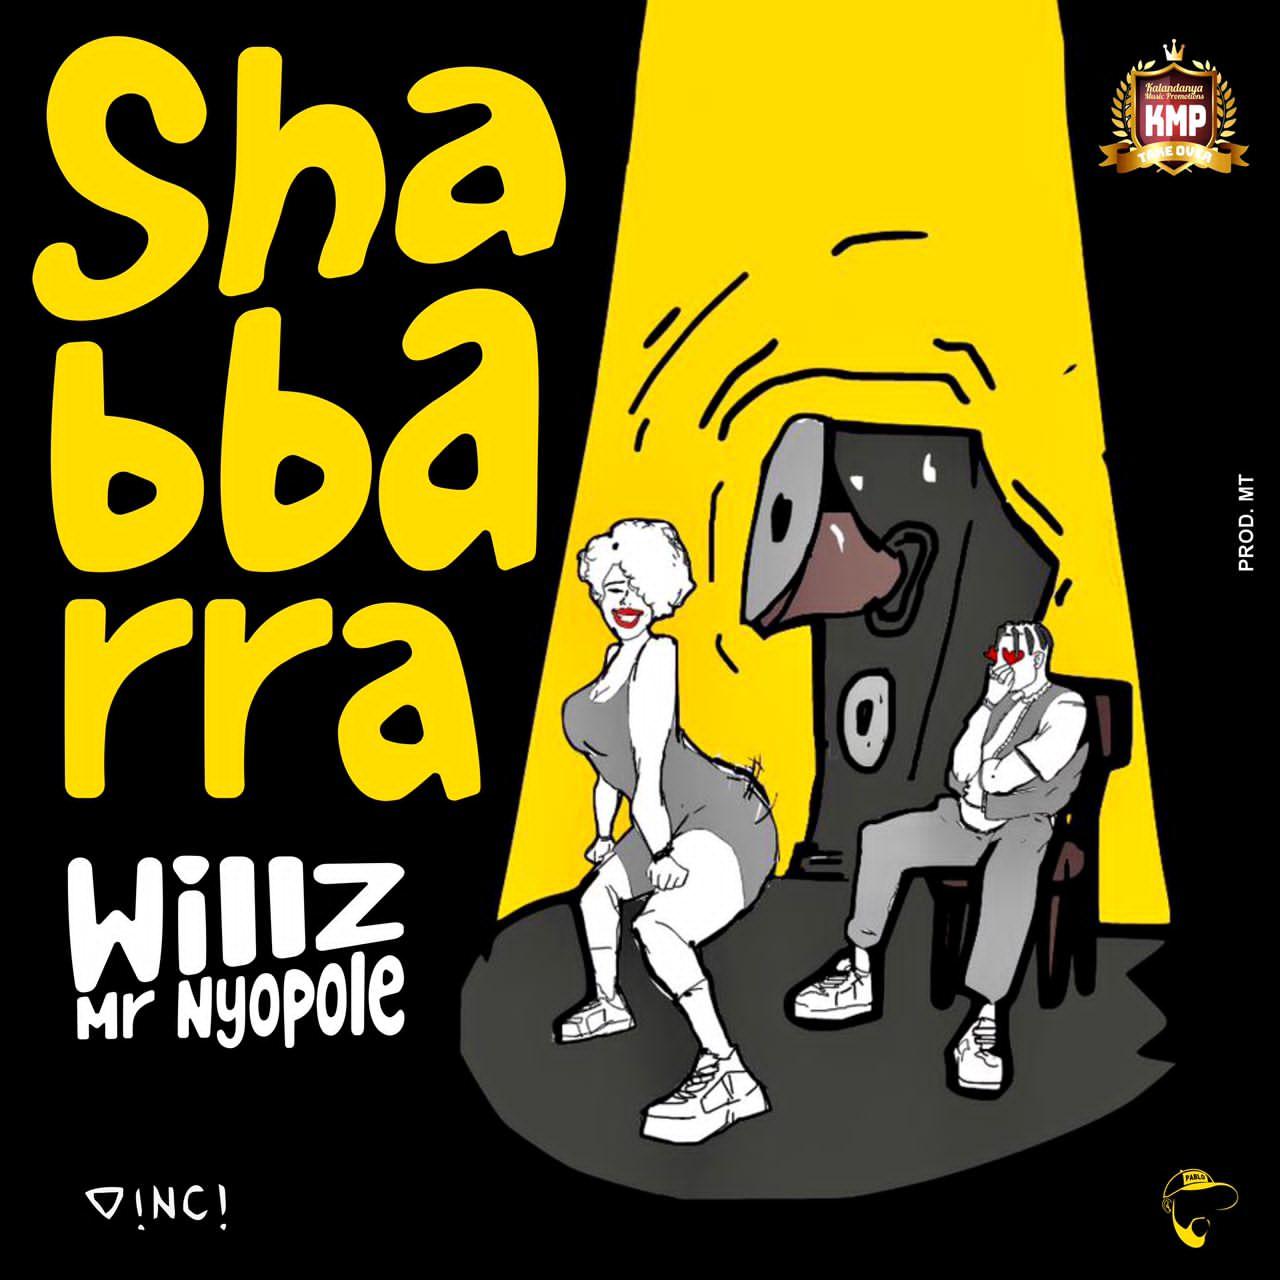 Willz Mr. Nyopole - Shabbarra